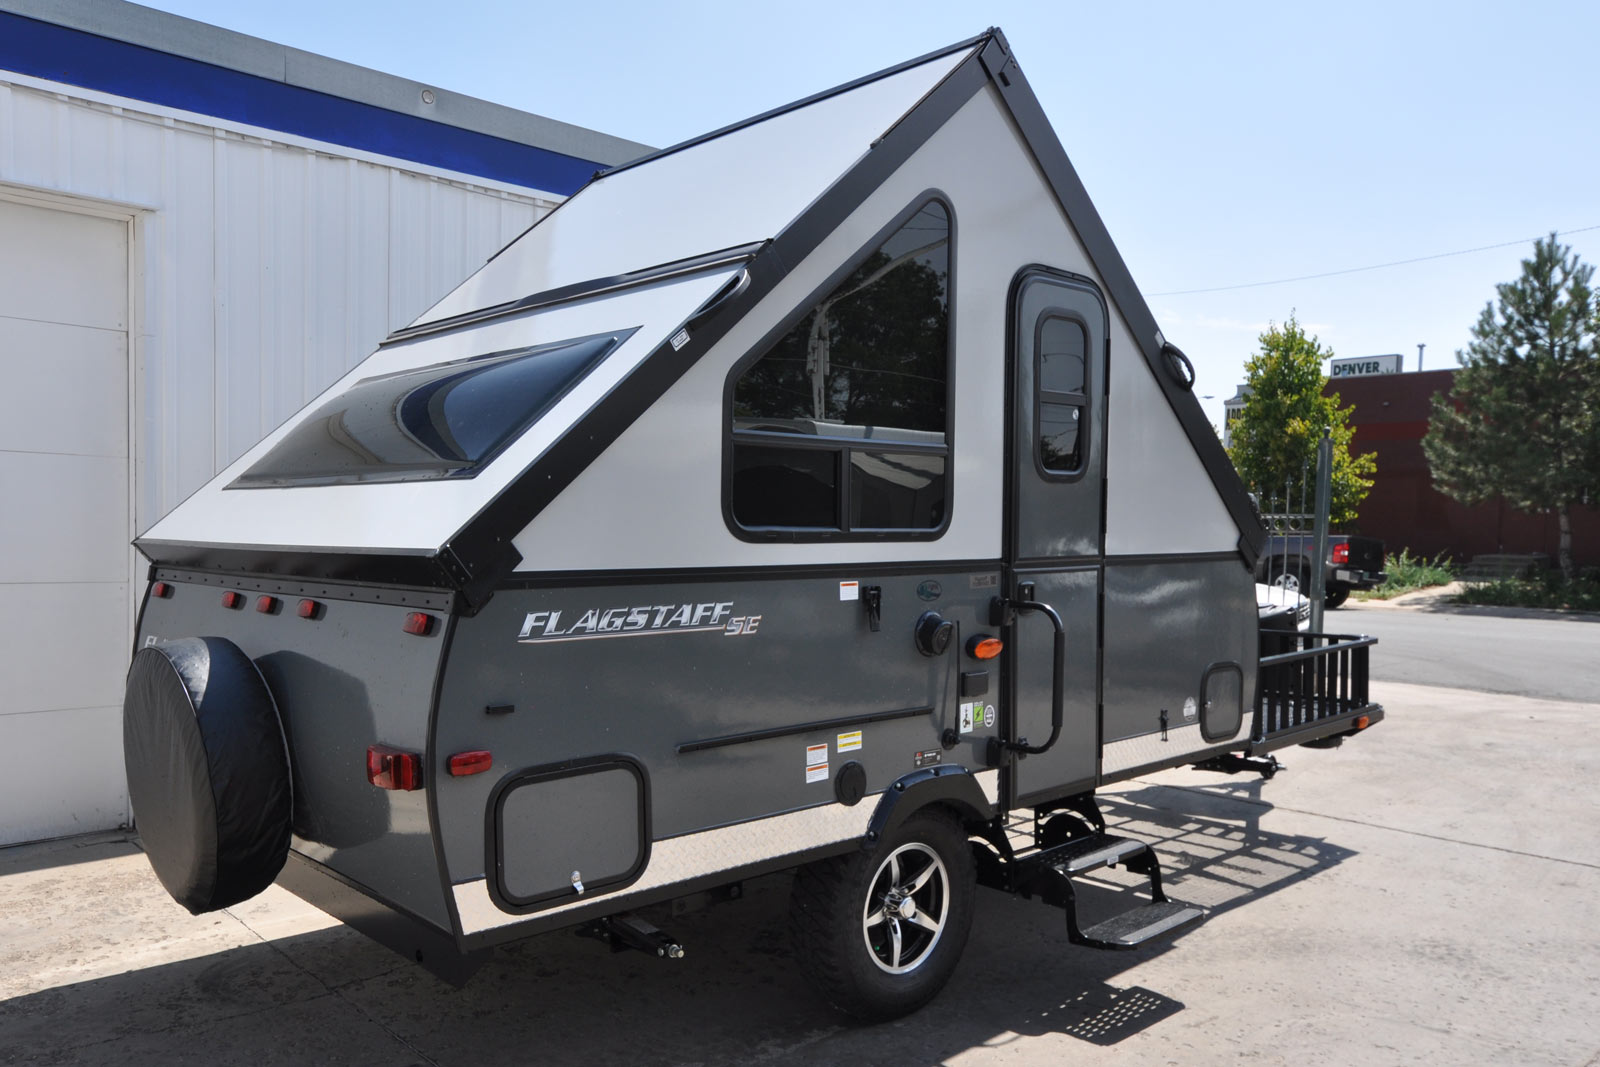 Flagstaff T12rbthse Camping Trailer Roberts Sales